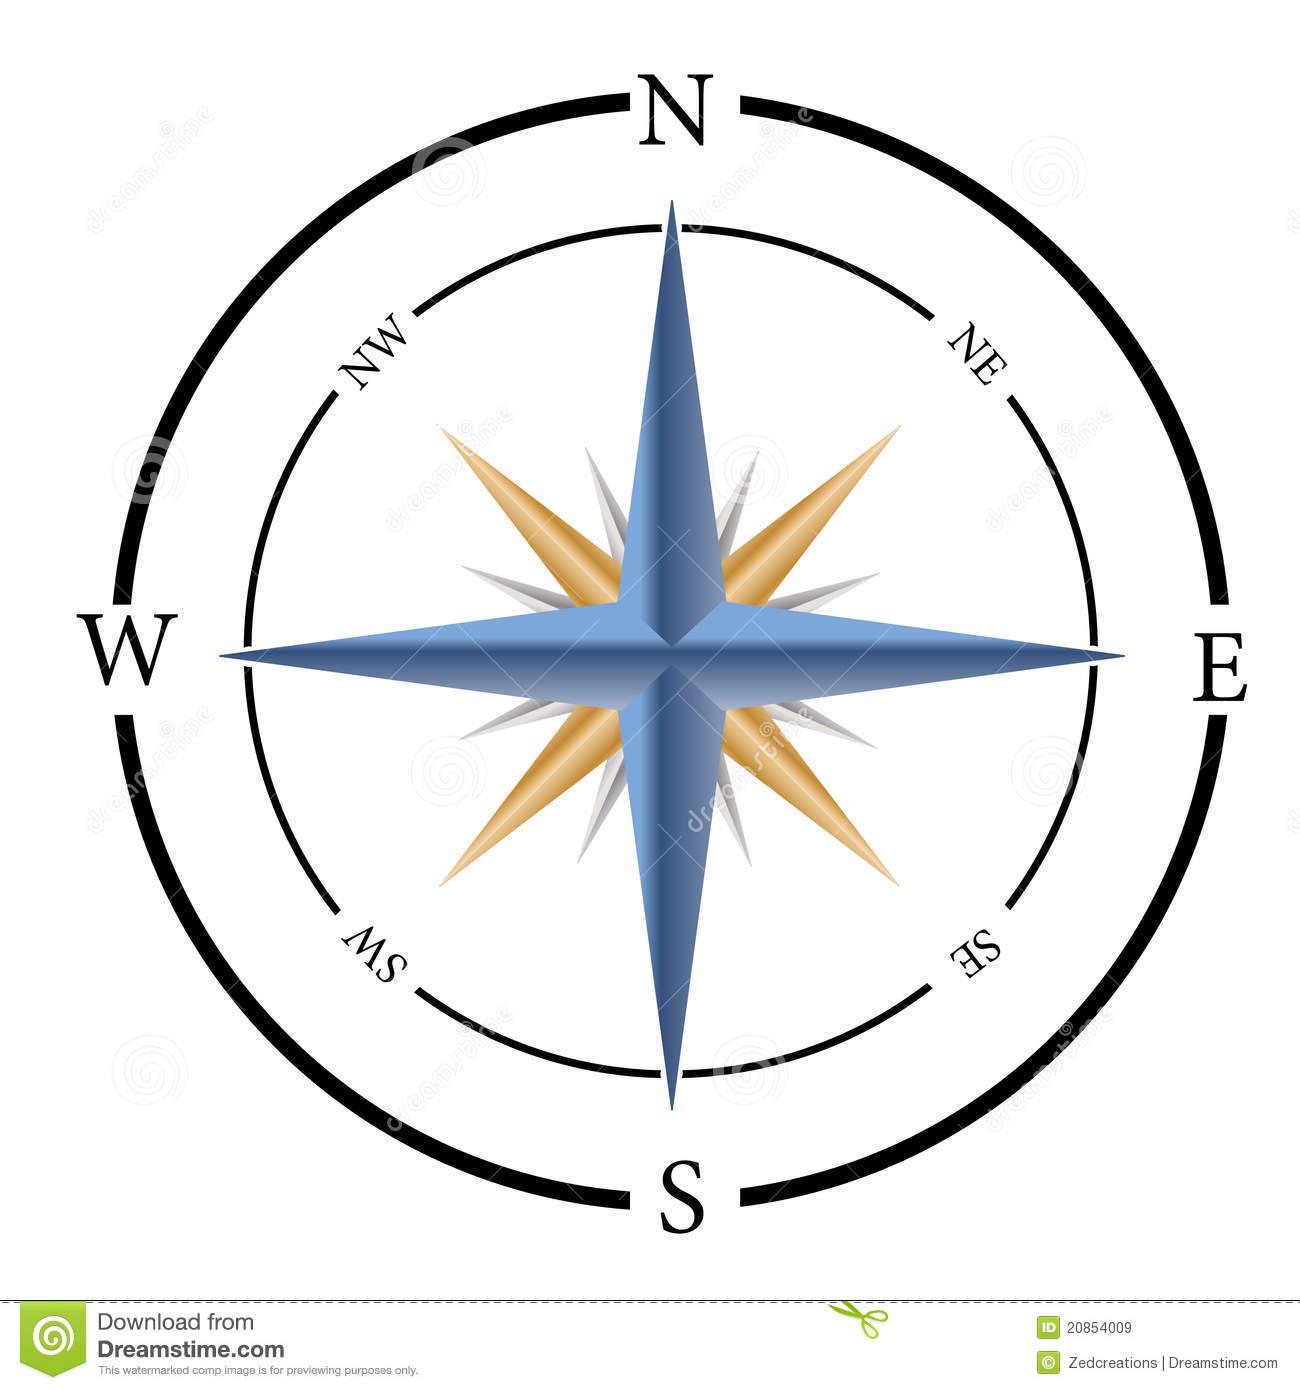 Компас - compass